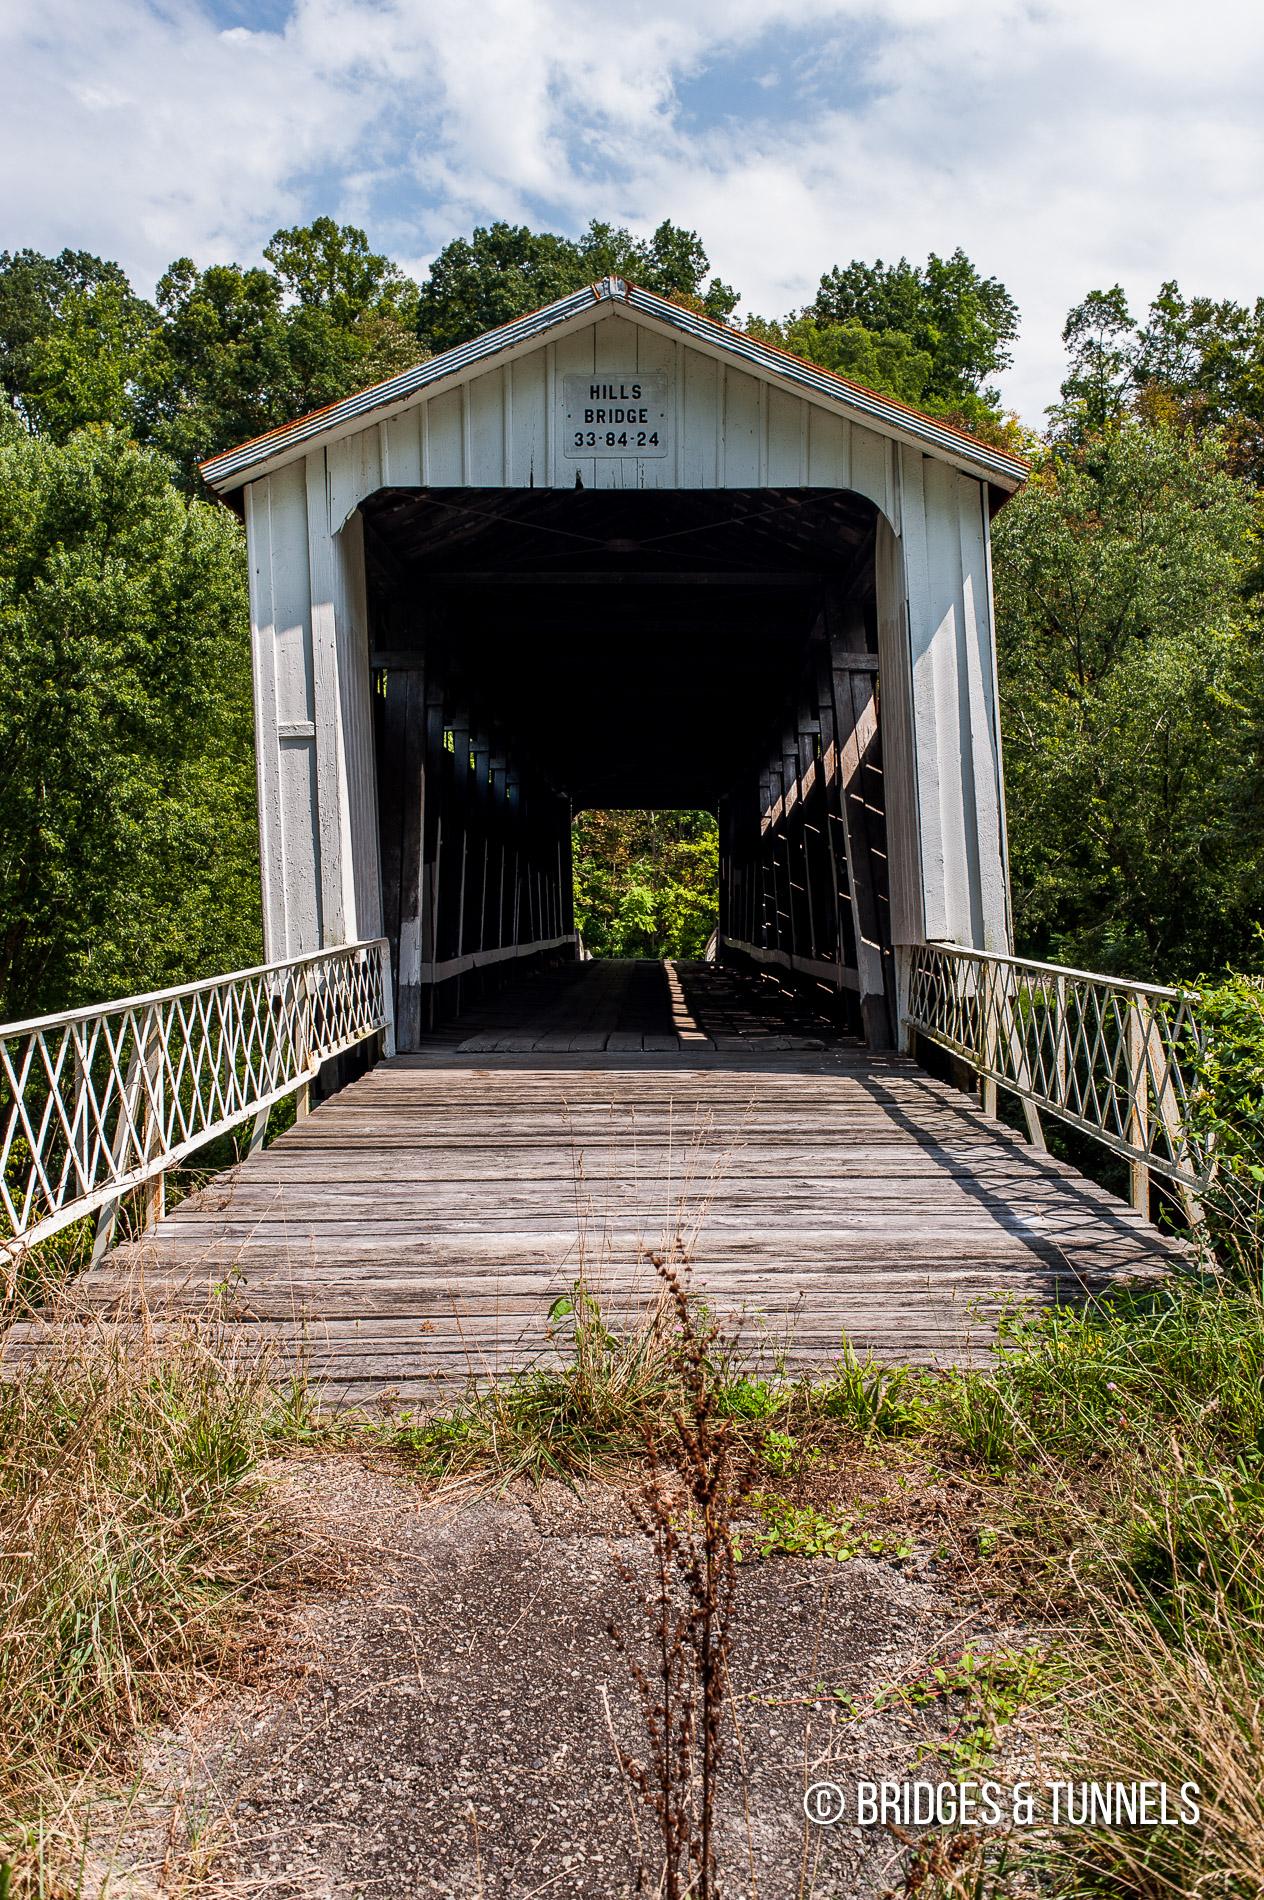 Hills / Hildreth Covered Bridge